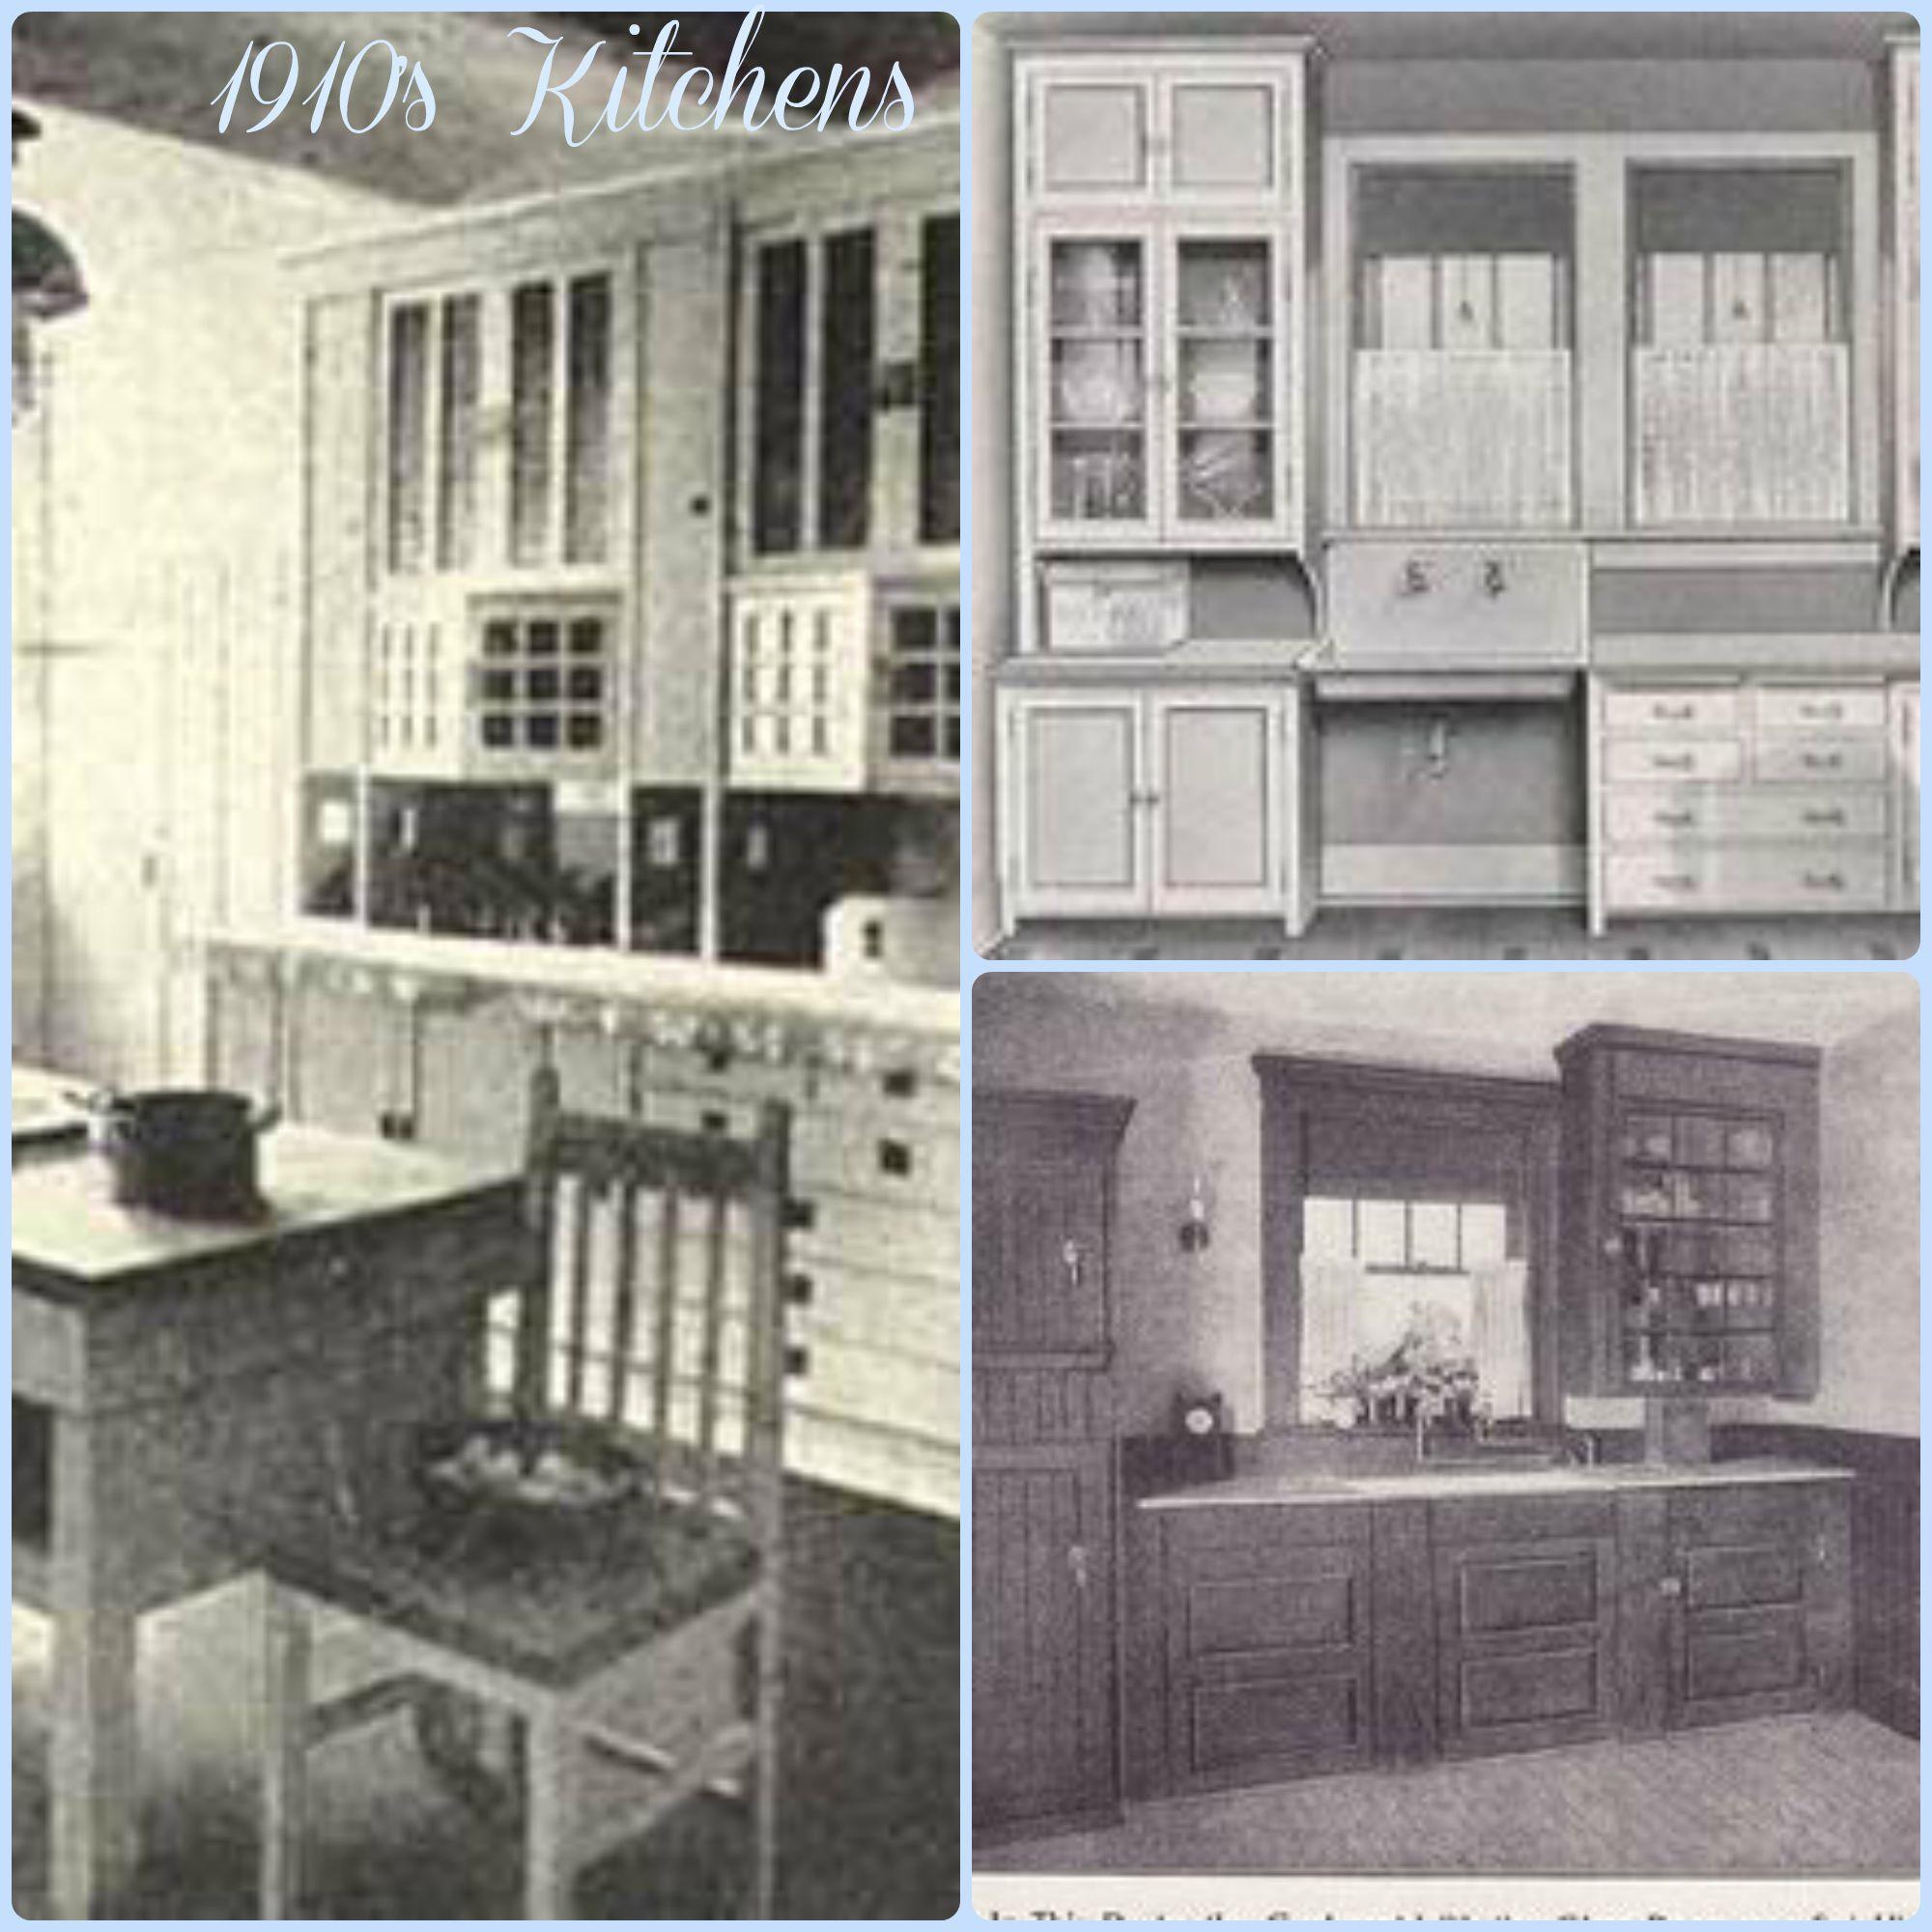 1910s Kitchens Jpg 2000 2000 Open Living Room Design Kitchen Pictures Victorian Homes